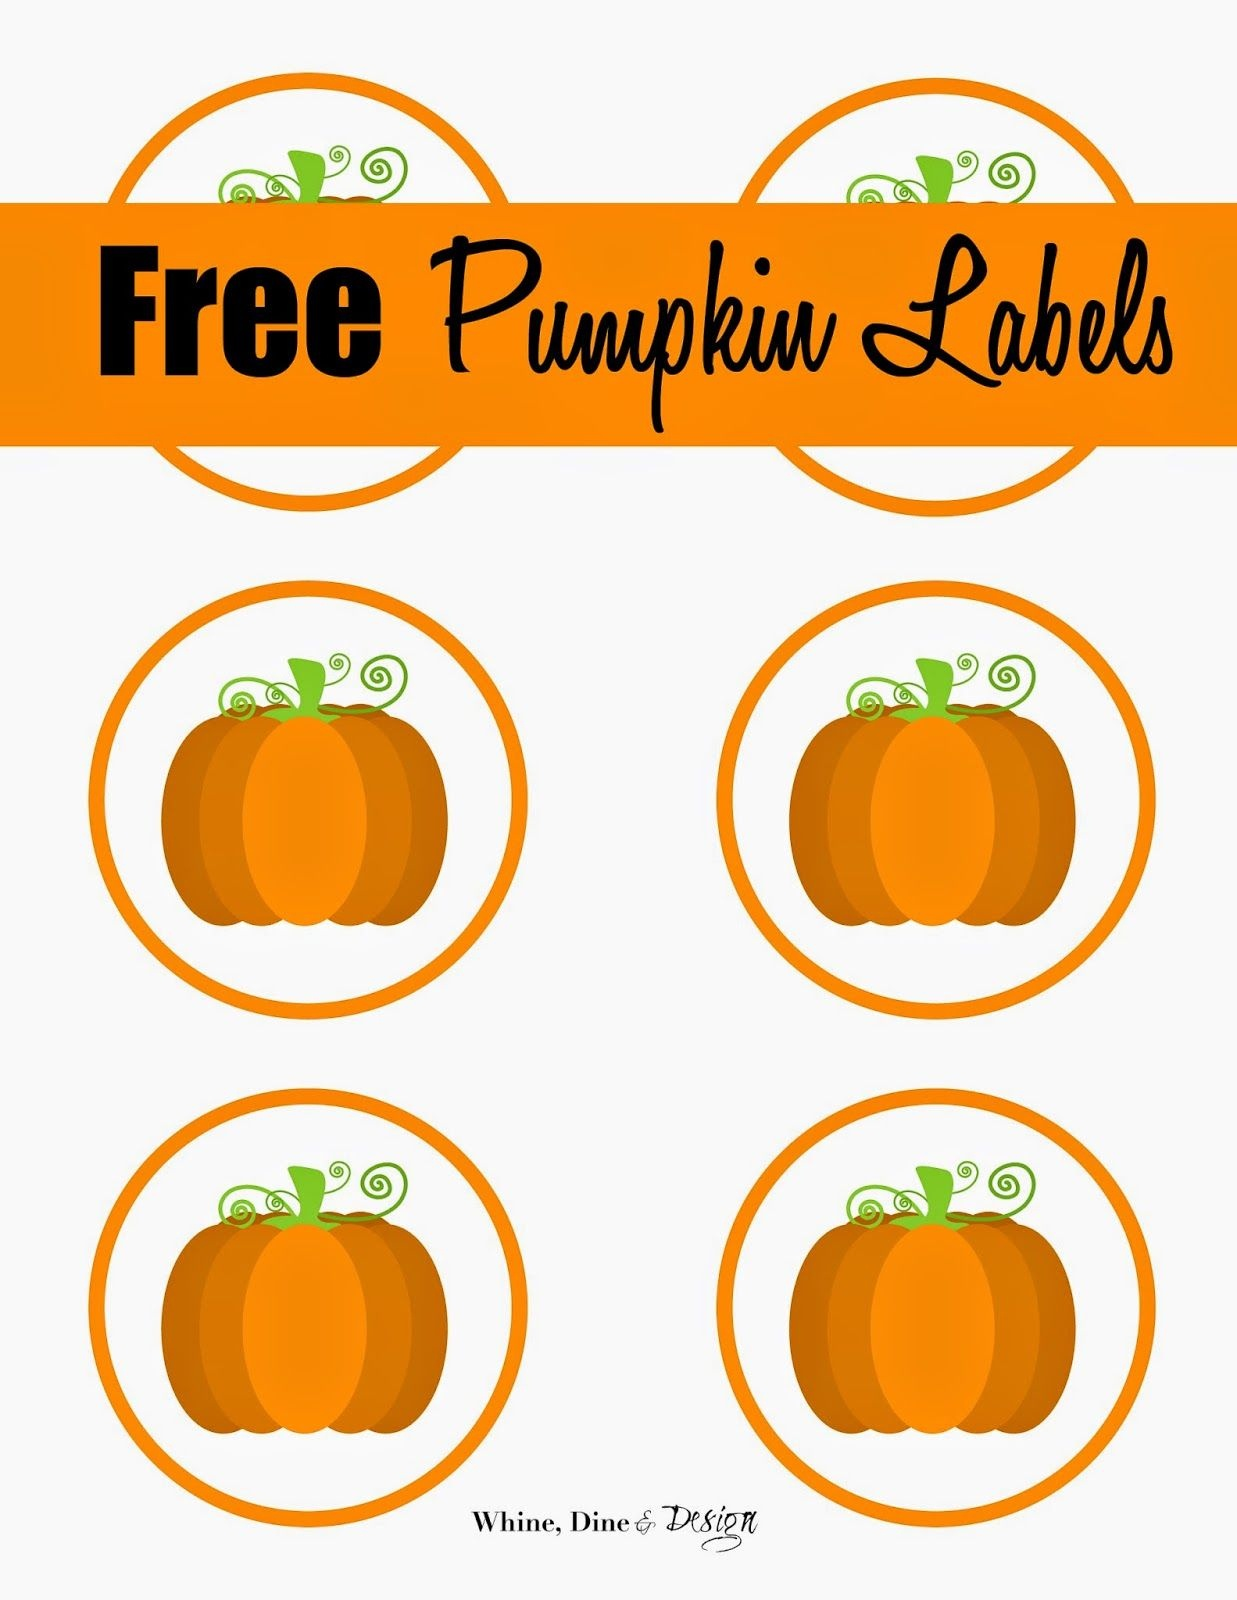 Free Printable Pumpkin Labels/cupcake Toppers | Craft Ideas/diy In - Free Printable Pumpkin Gift Tags